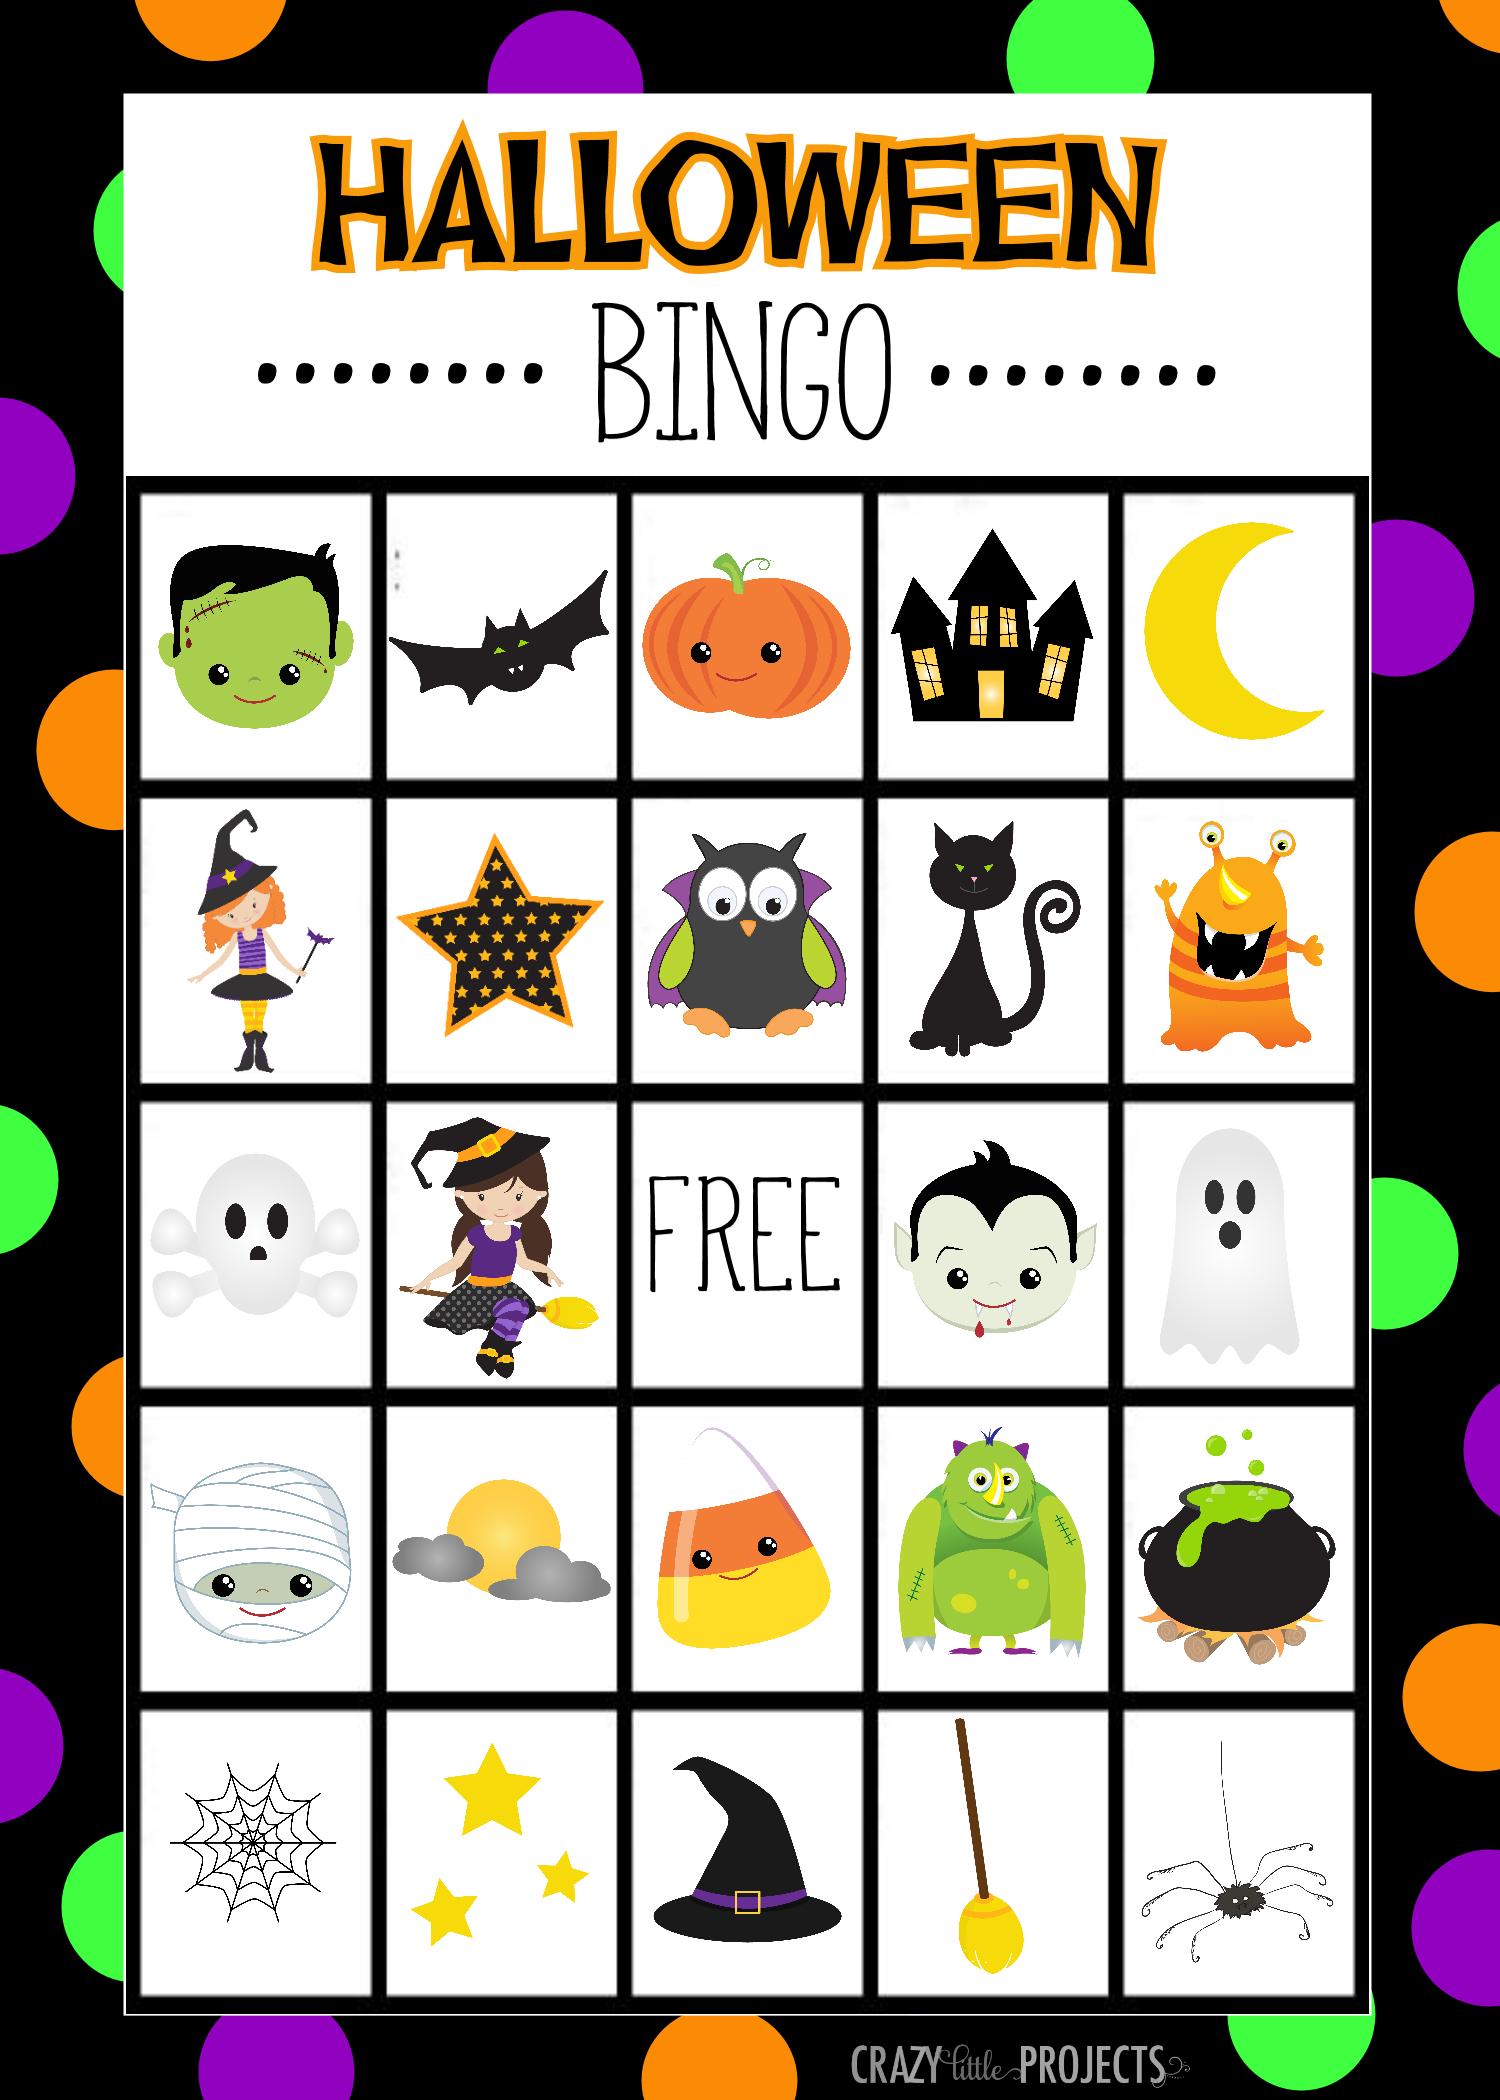 Free Printable Halloween Bingo Cardscrazy Little Projects - Free Printable Halloween Bingo